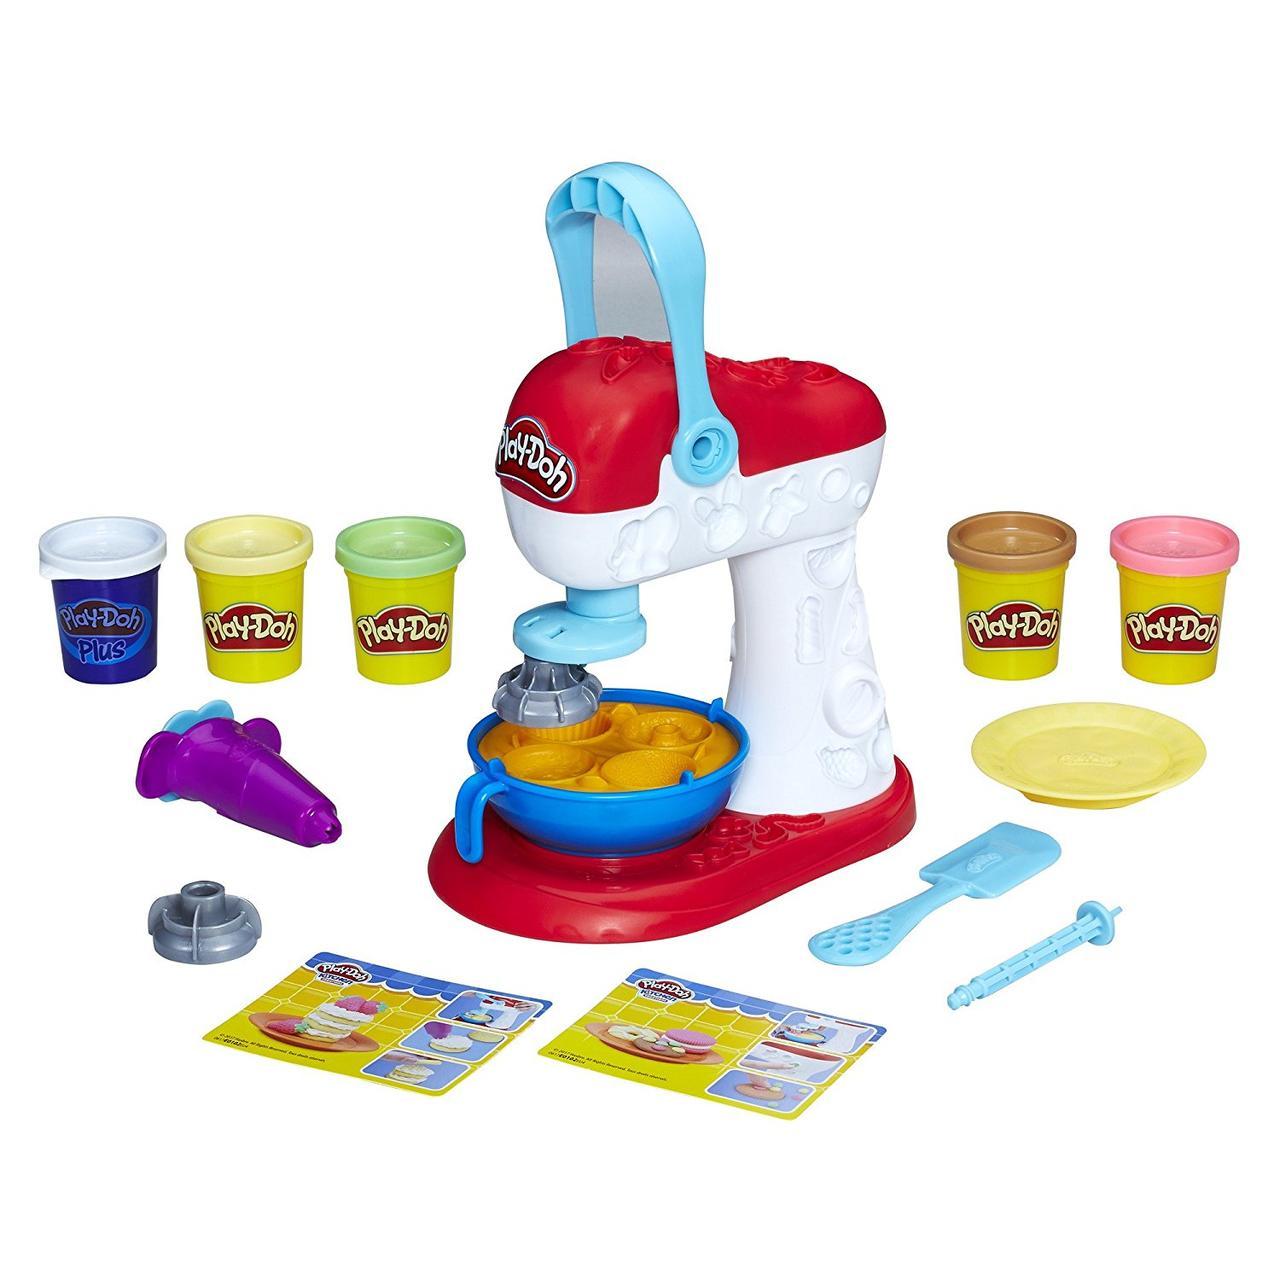 Набор пластилина Play-Doh миксер для сладостей